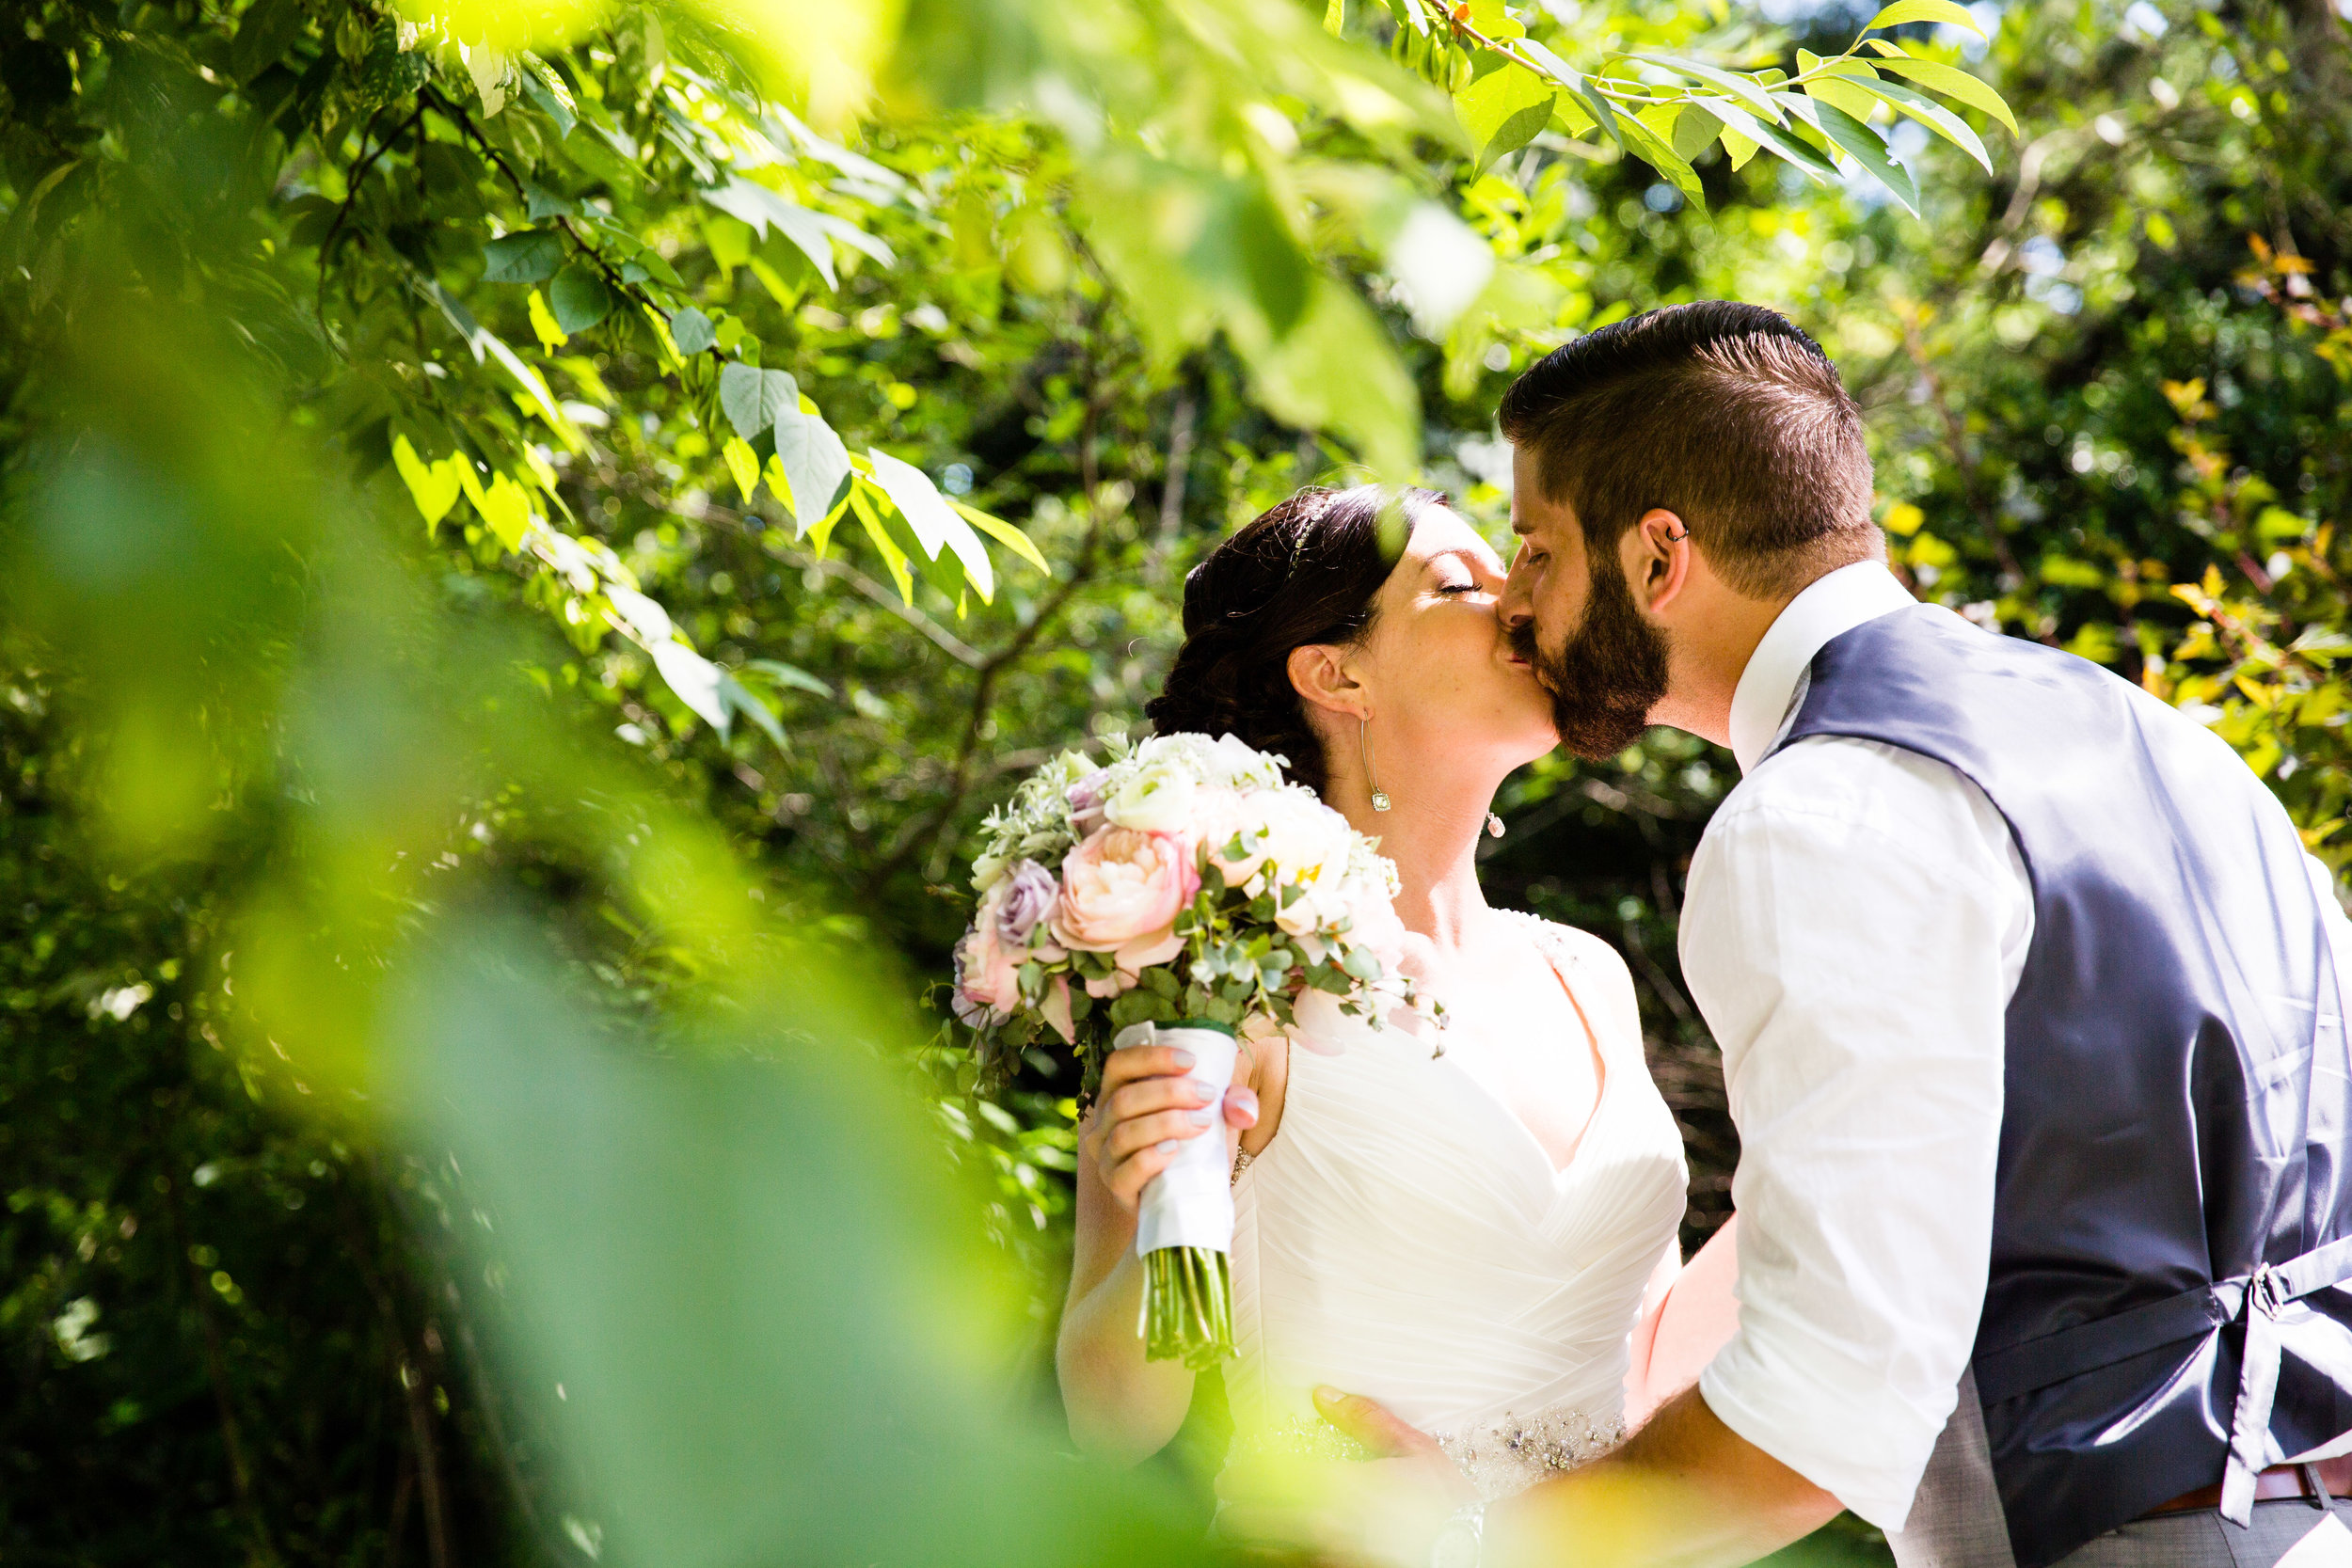 TYLER ARBORETUM WEDDING PHOTOGRAPHY LOVESTRUCK PICTURES-018.jpg